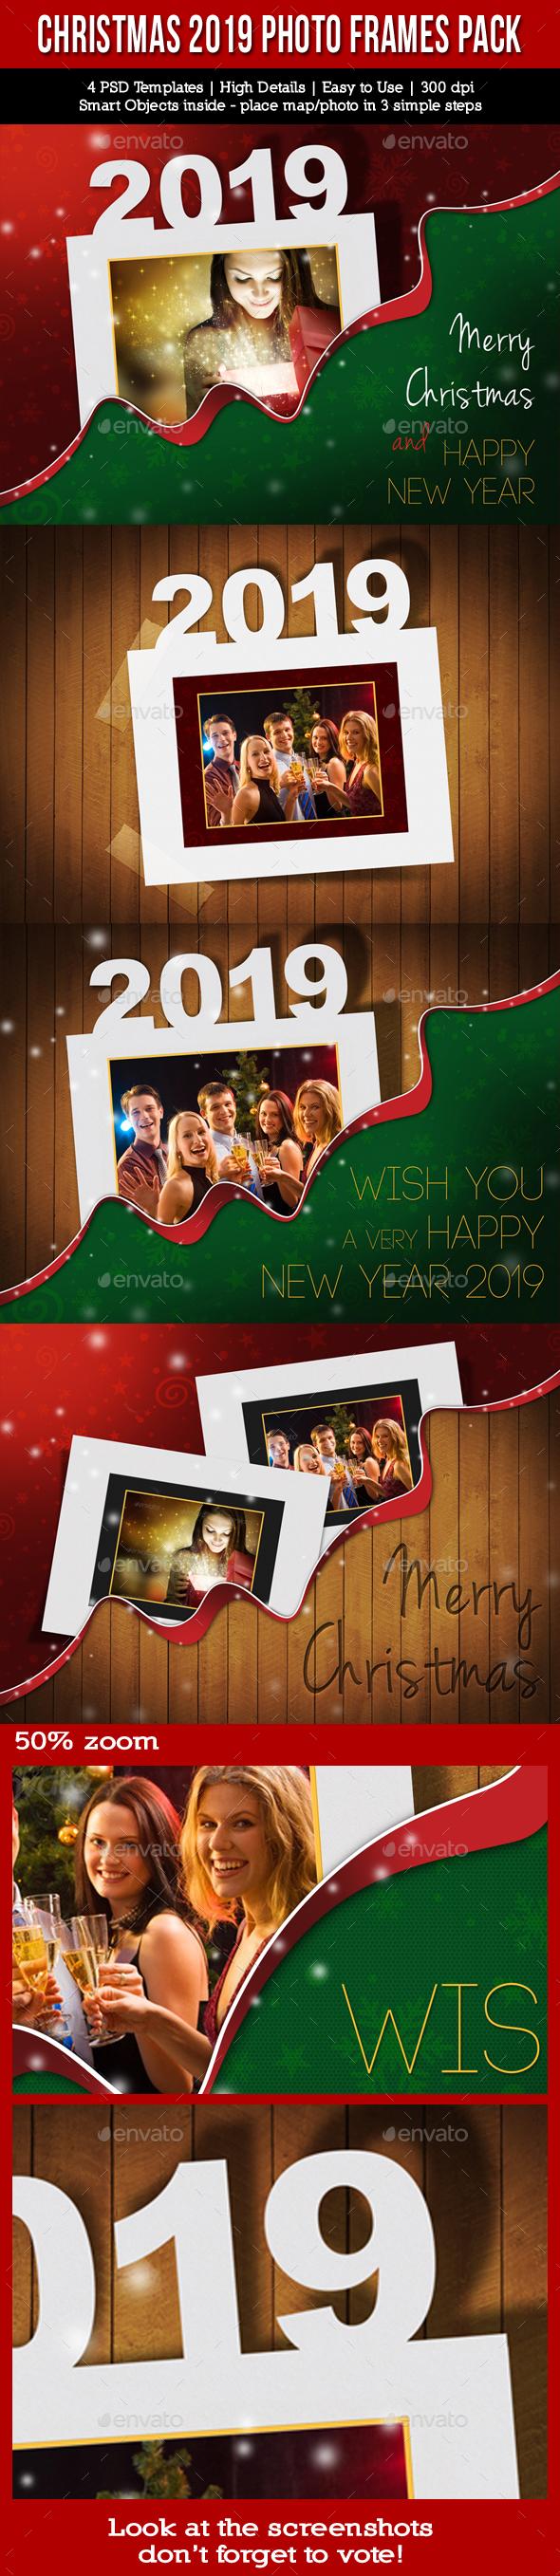 Christmas Holidays 2019 Photo Frames Pack - Seasonal Photo Templates